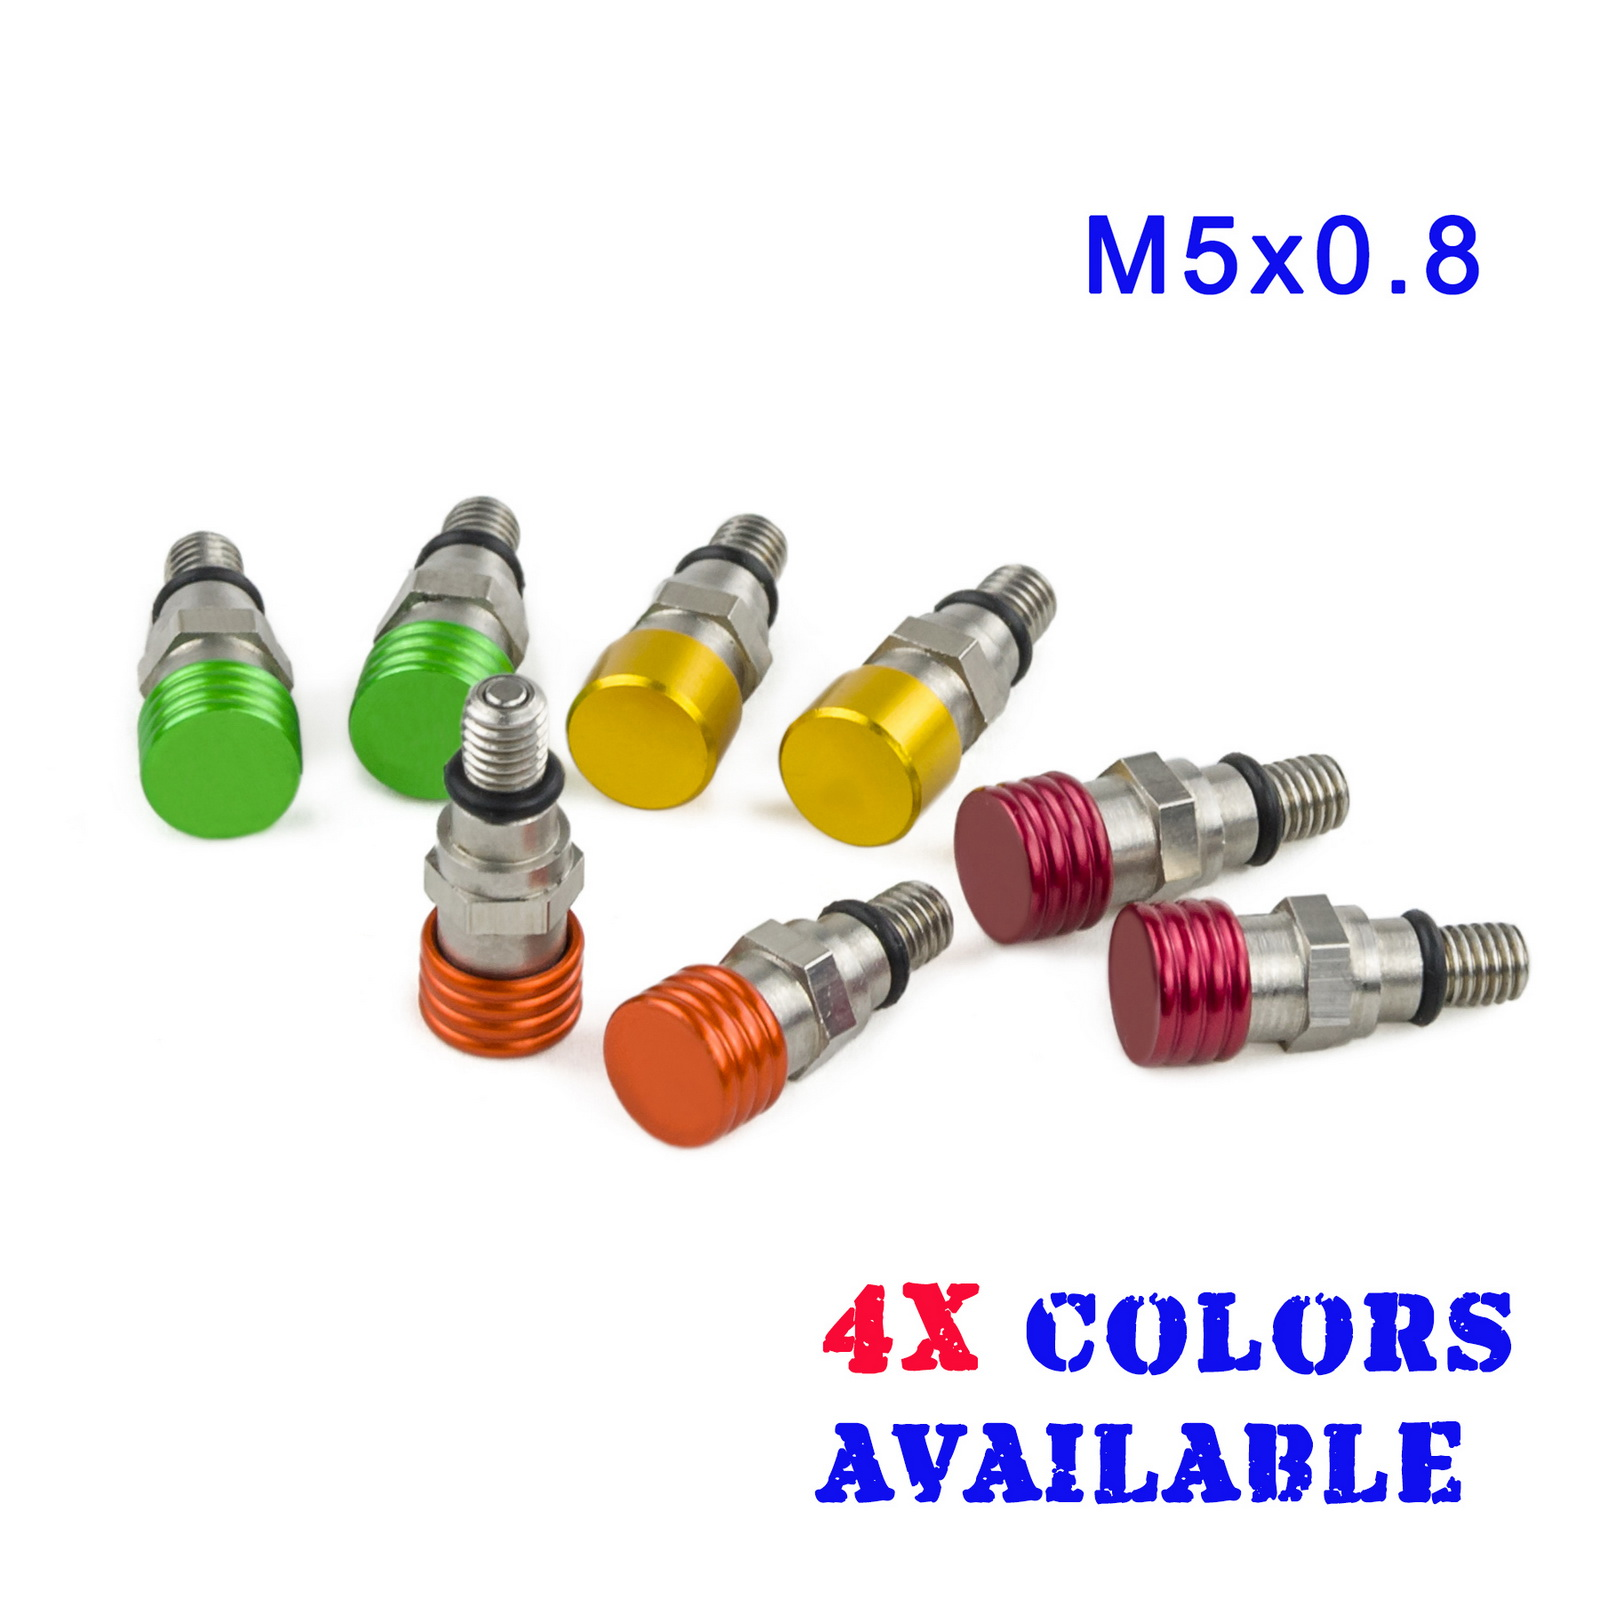 M5x0.8 Мотокросс Вилка воздуха, Кровинки сброса давления для YAMAHA YZ85 YZ125 WR250 YZF250 YZF450 400 426 450 TTR230 TTR250